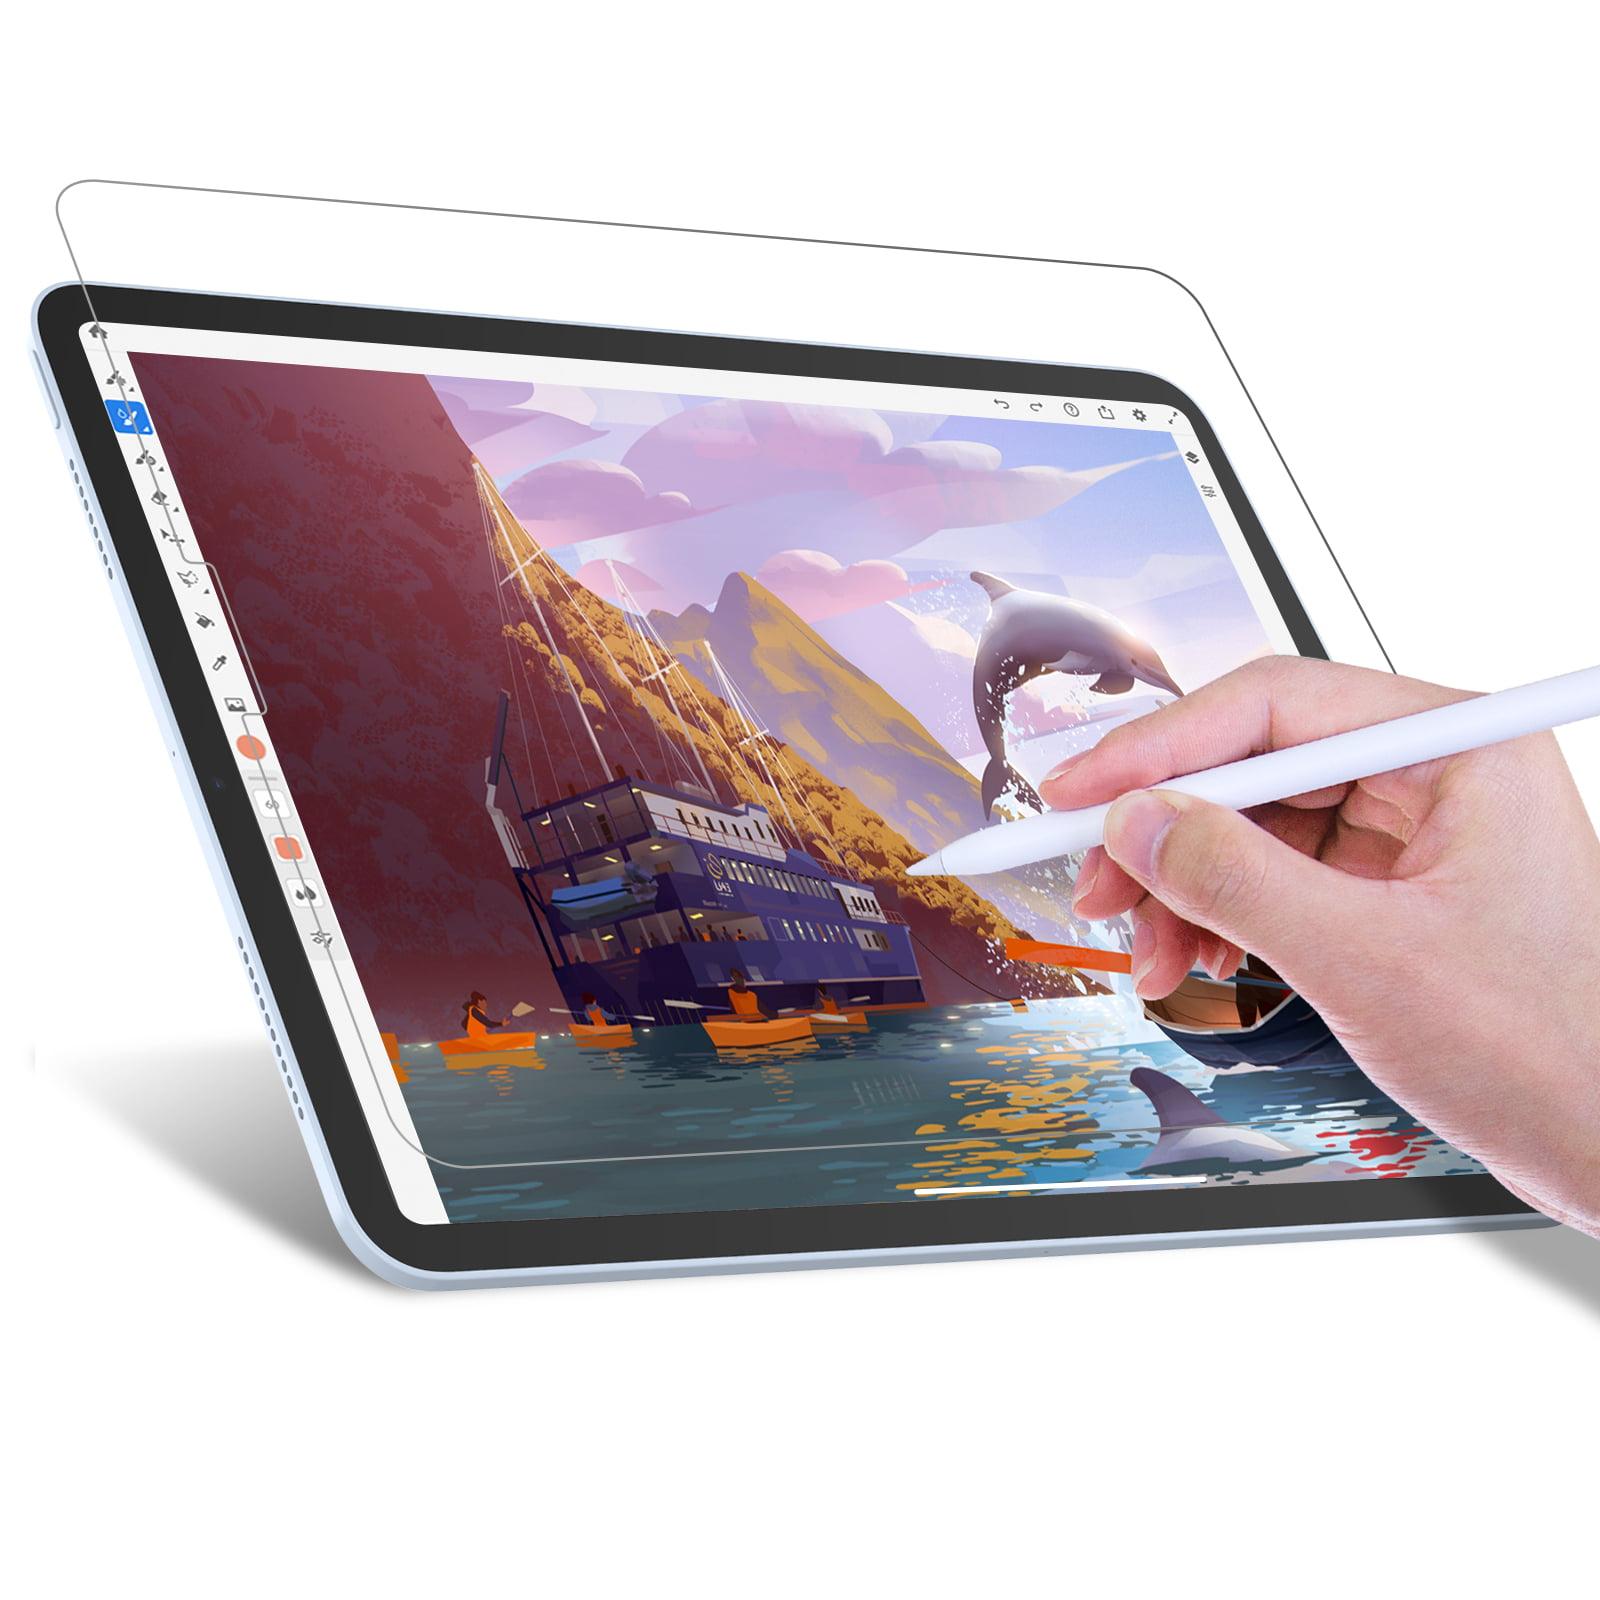 Paperfeel Screen Protector for iPad Air 4 10.9-Inch, iPad ...